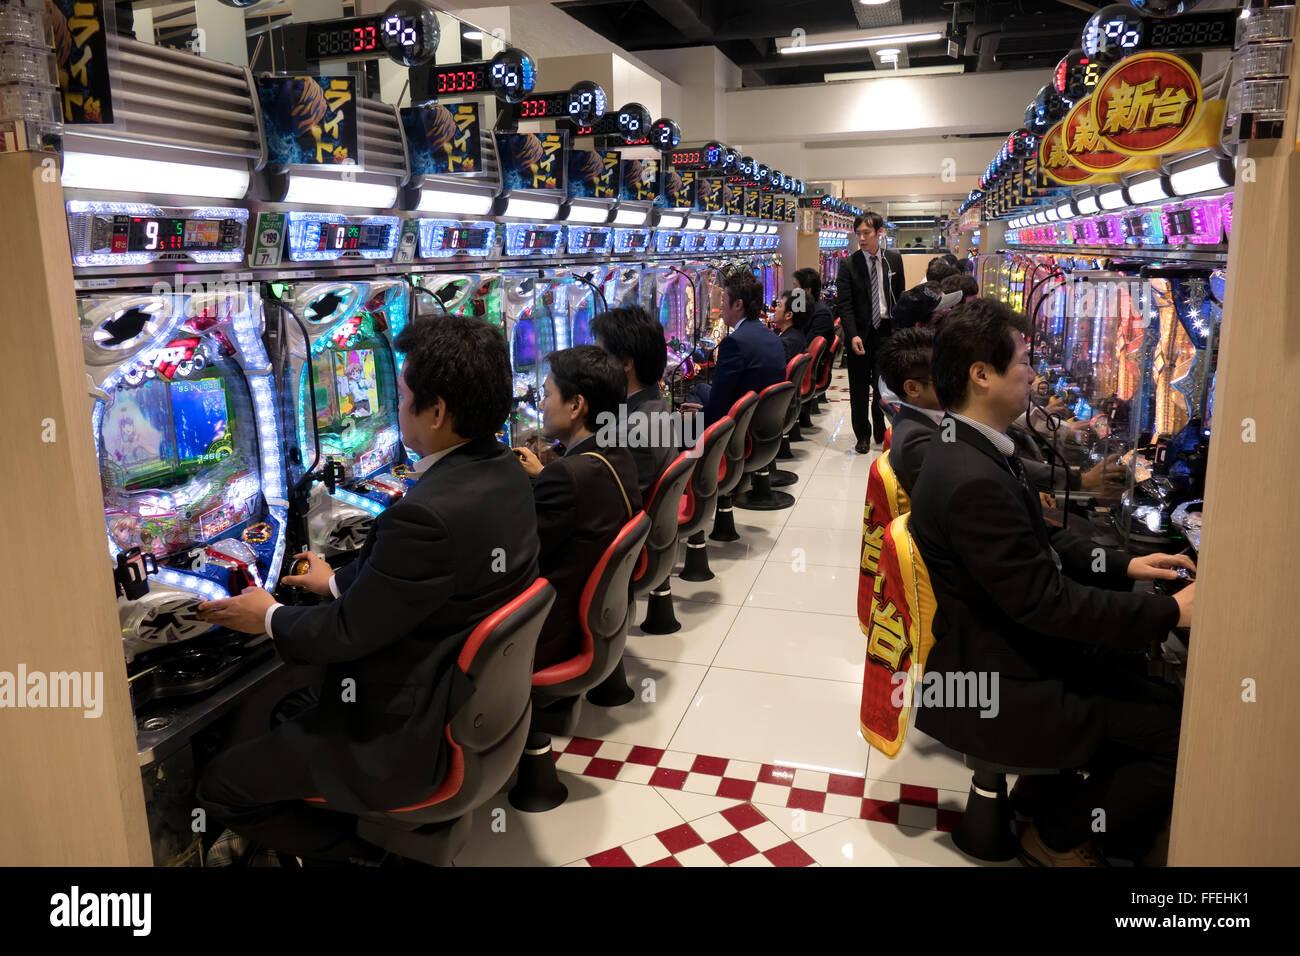 Japanese people playing pachinko, lottery, arcade game, video games, gambling, slot machines in Asian casino. Tokyo, - Stock Image